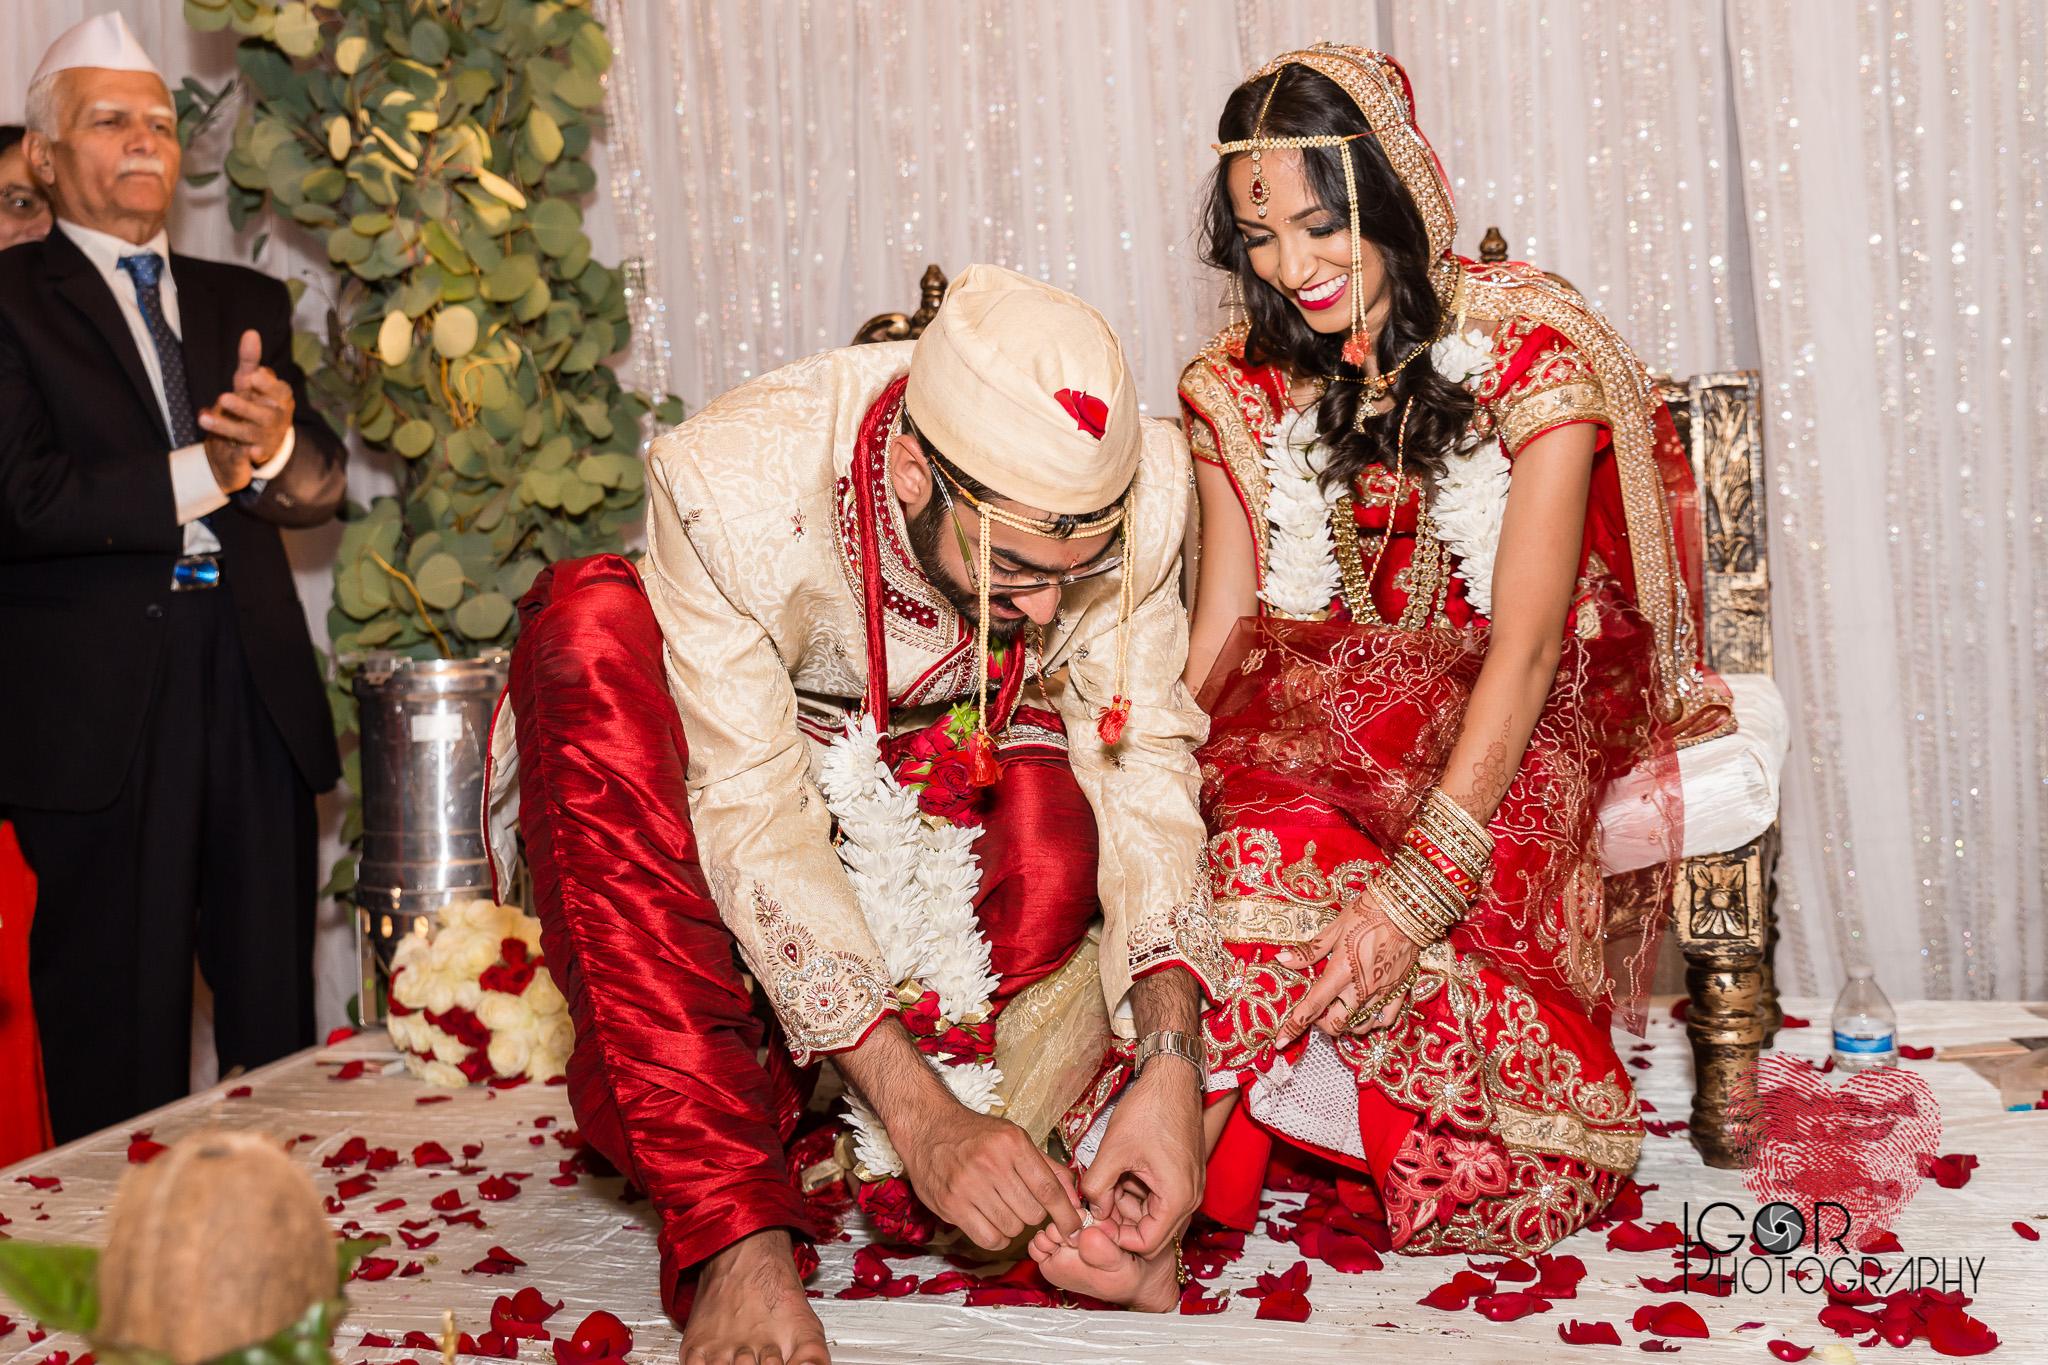 Indian wedding toe ring